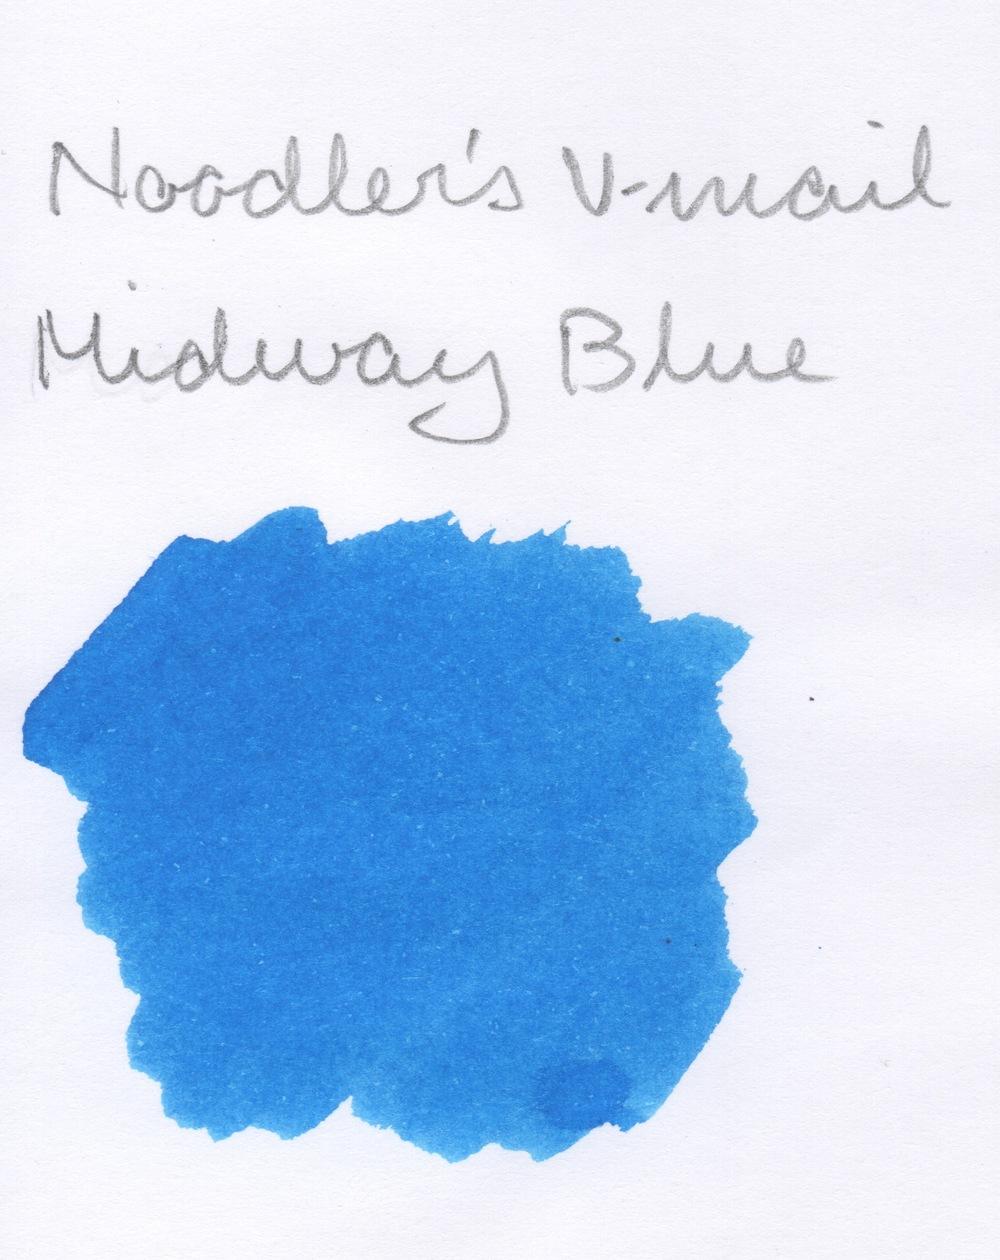 Noodlers Midway Blue.jpeg